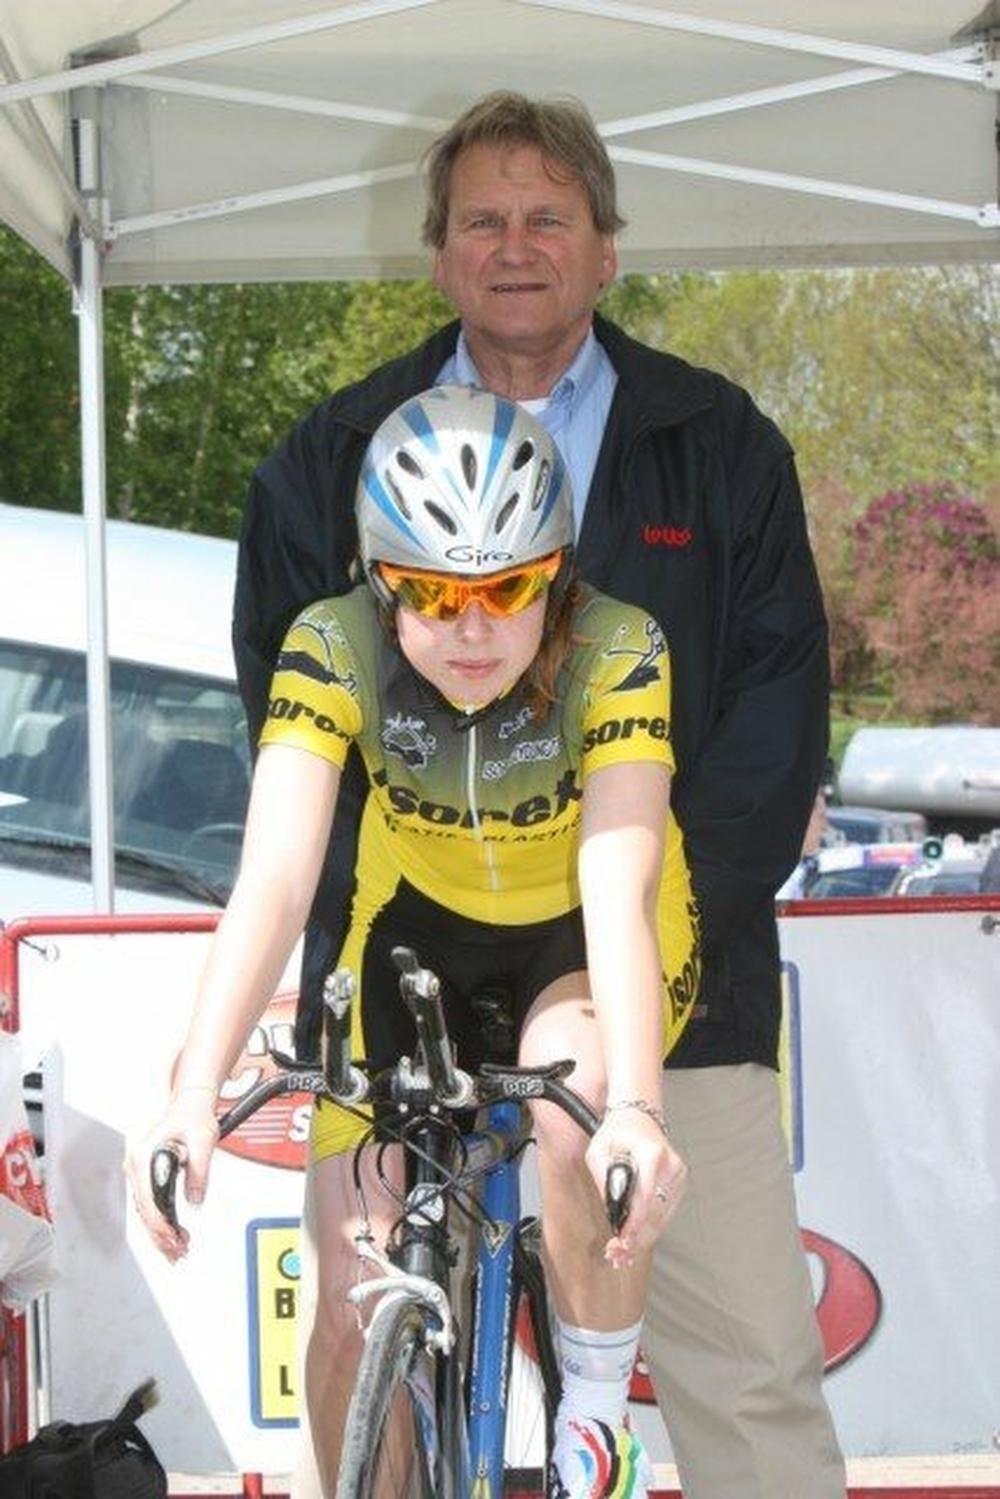 Naomi Van Coppernolle, ex-wielrenster én de sterke vrouw achter profrenner Dieter Bouvry